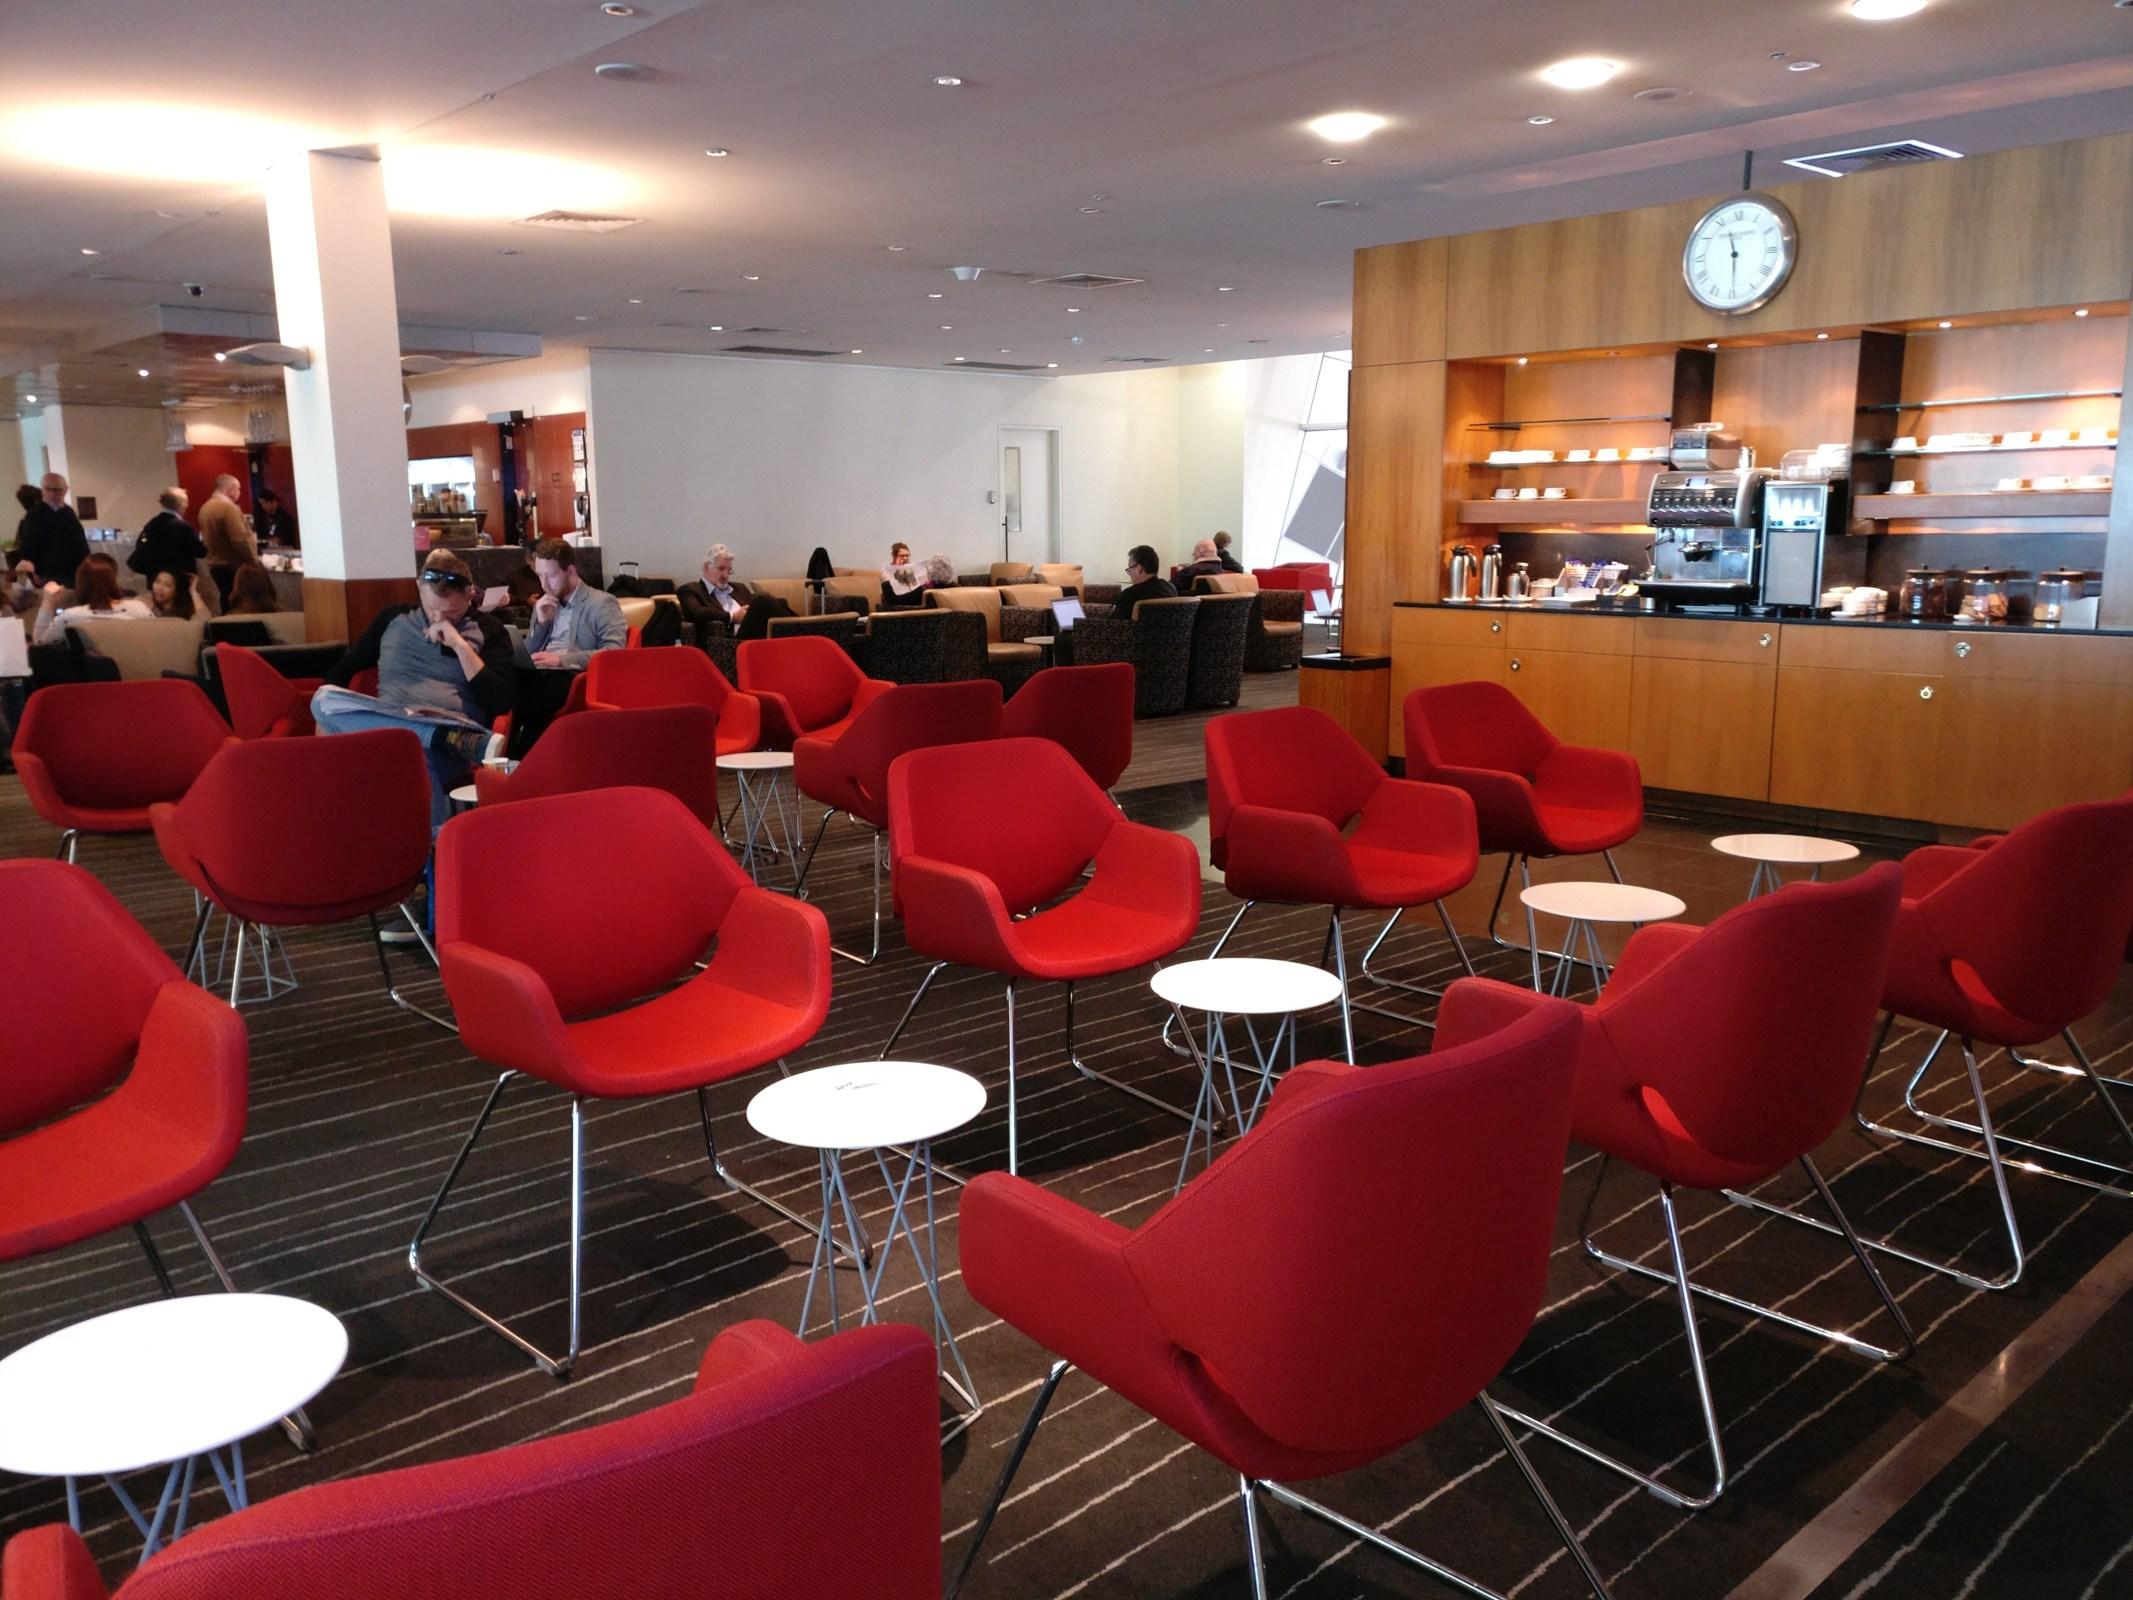 Qantas Club Melbourne Seating